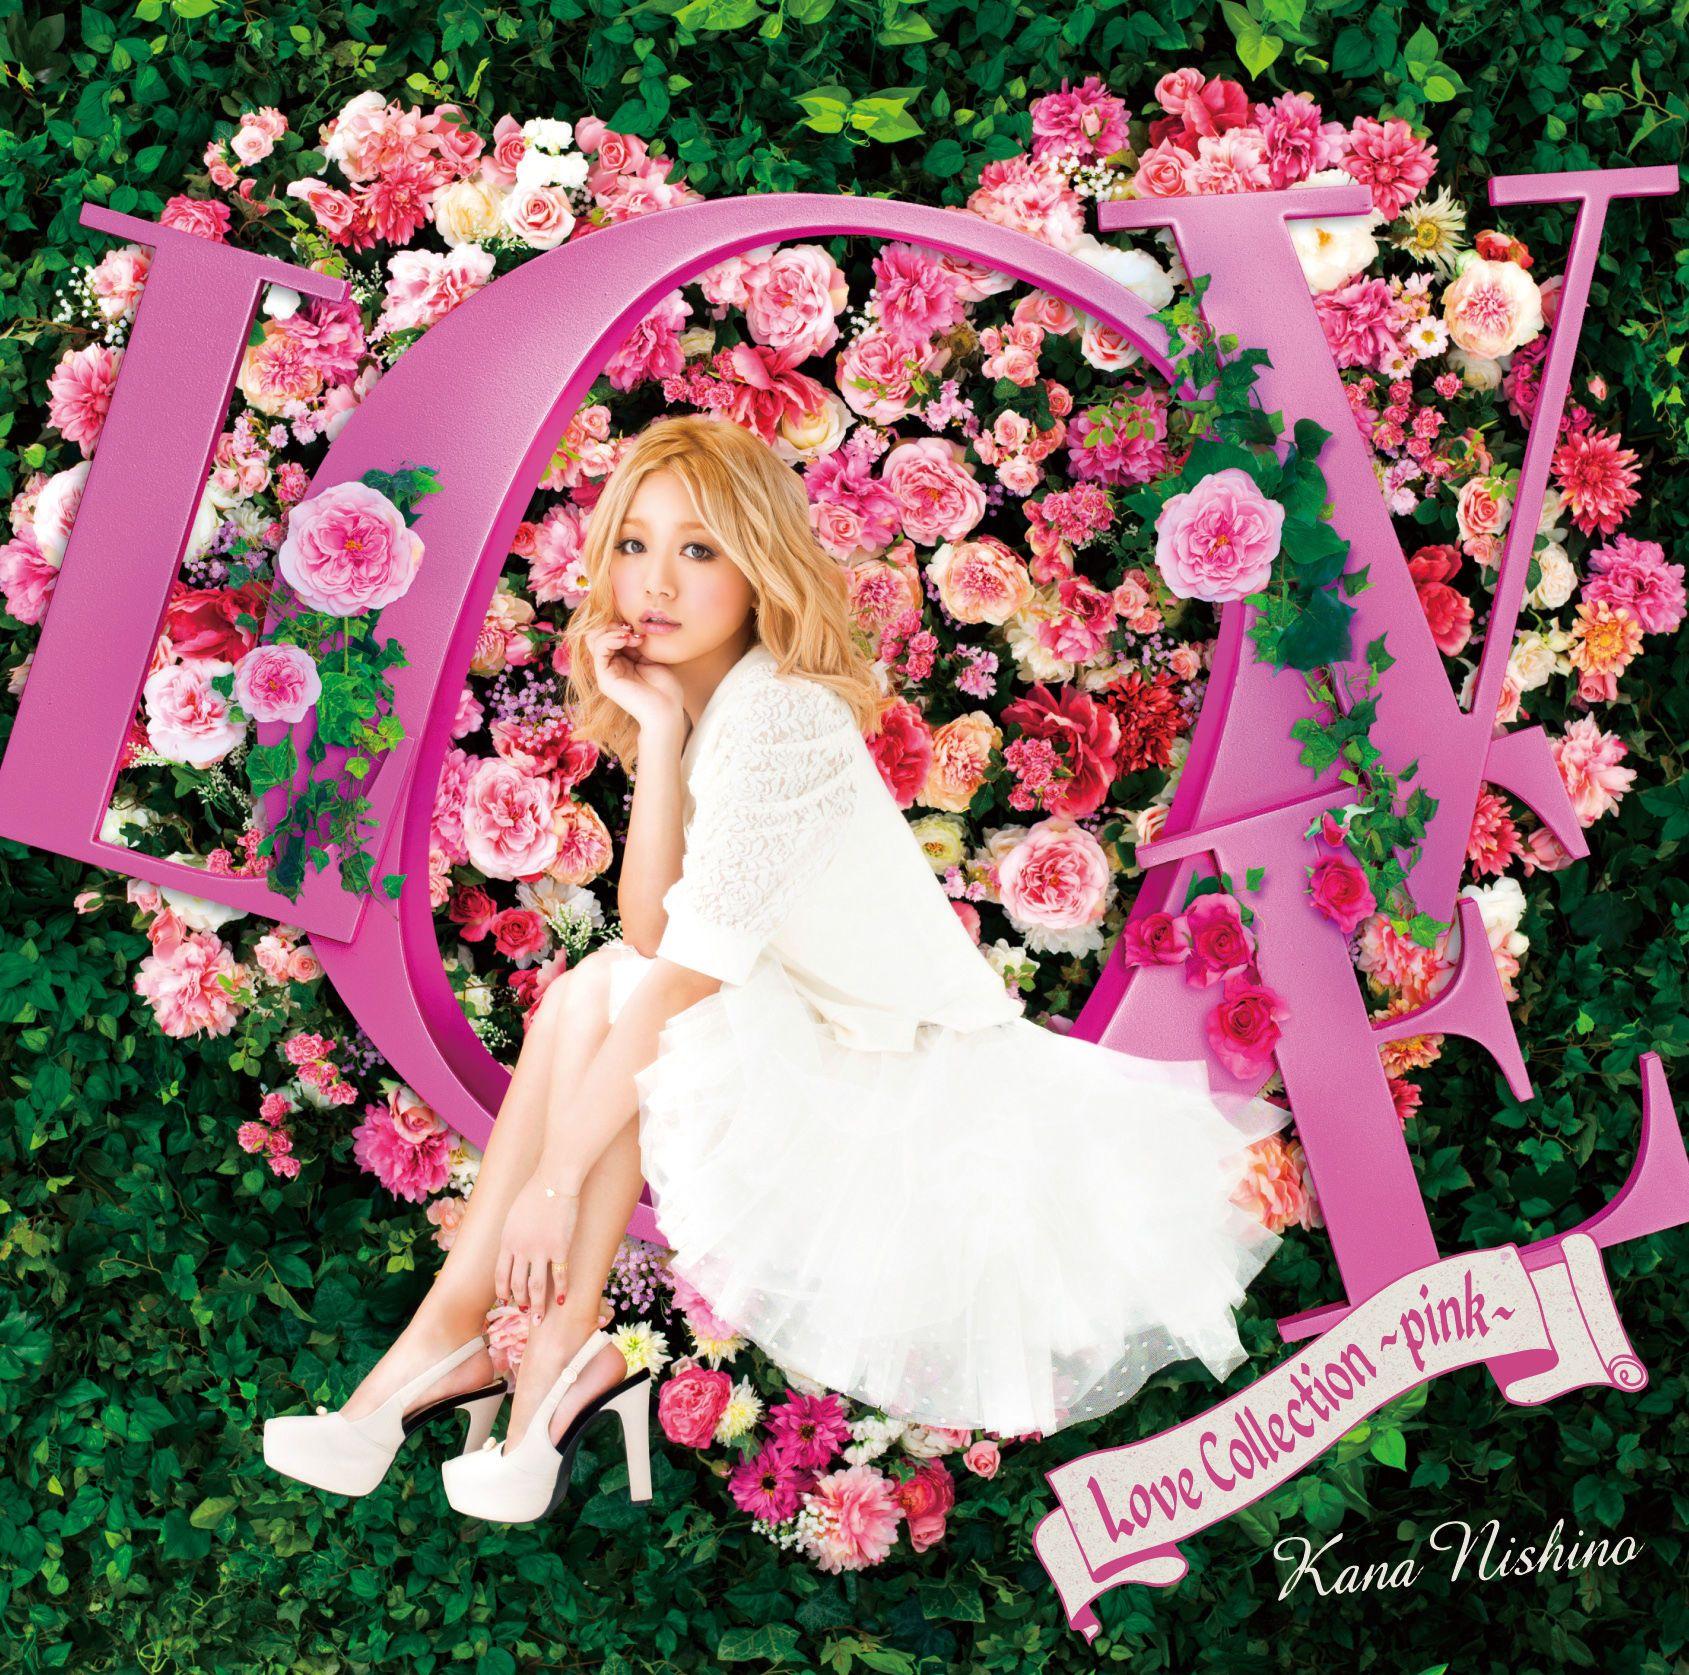 Kana Nishino - Love Collection - pink